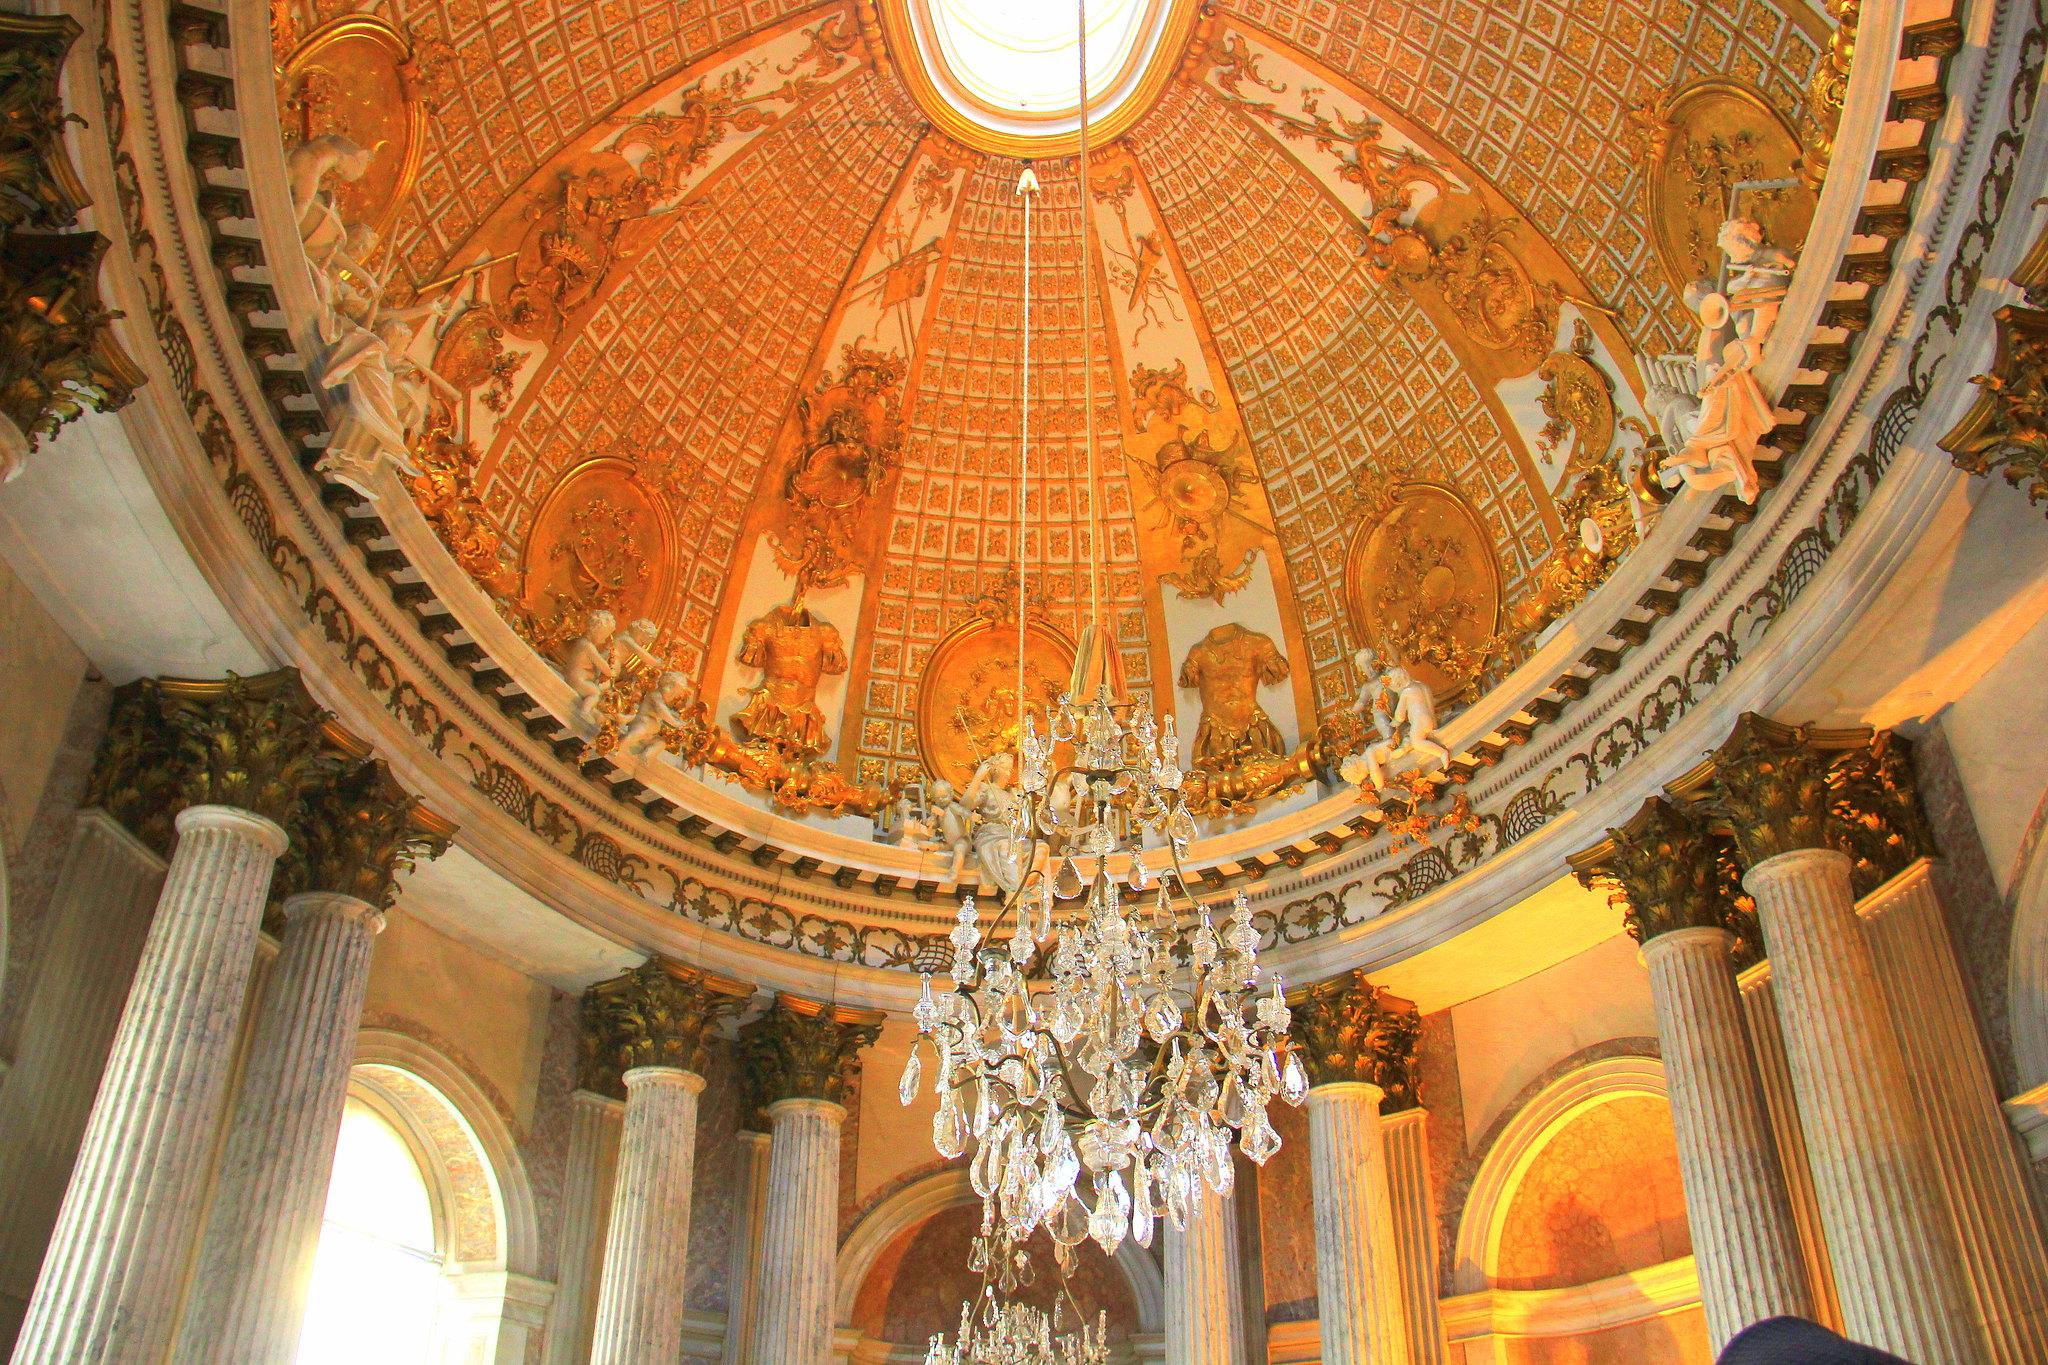 Sansouci park has many palaces in Potsdam